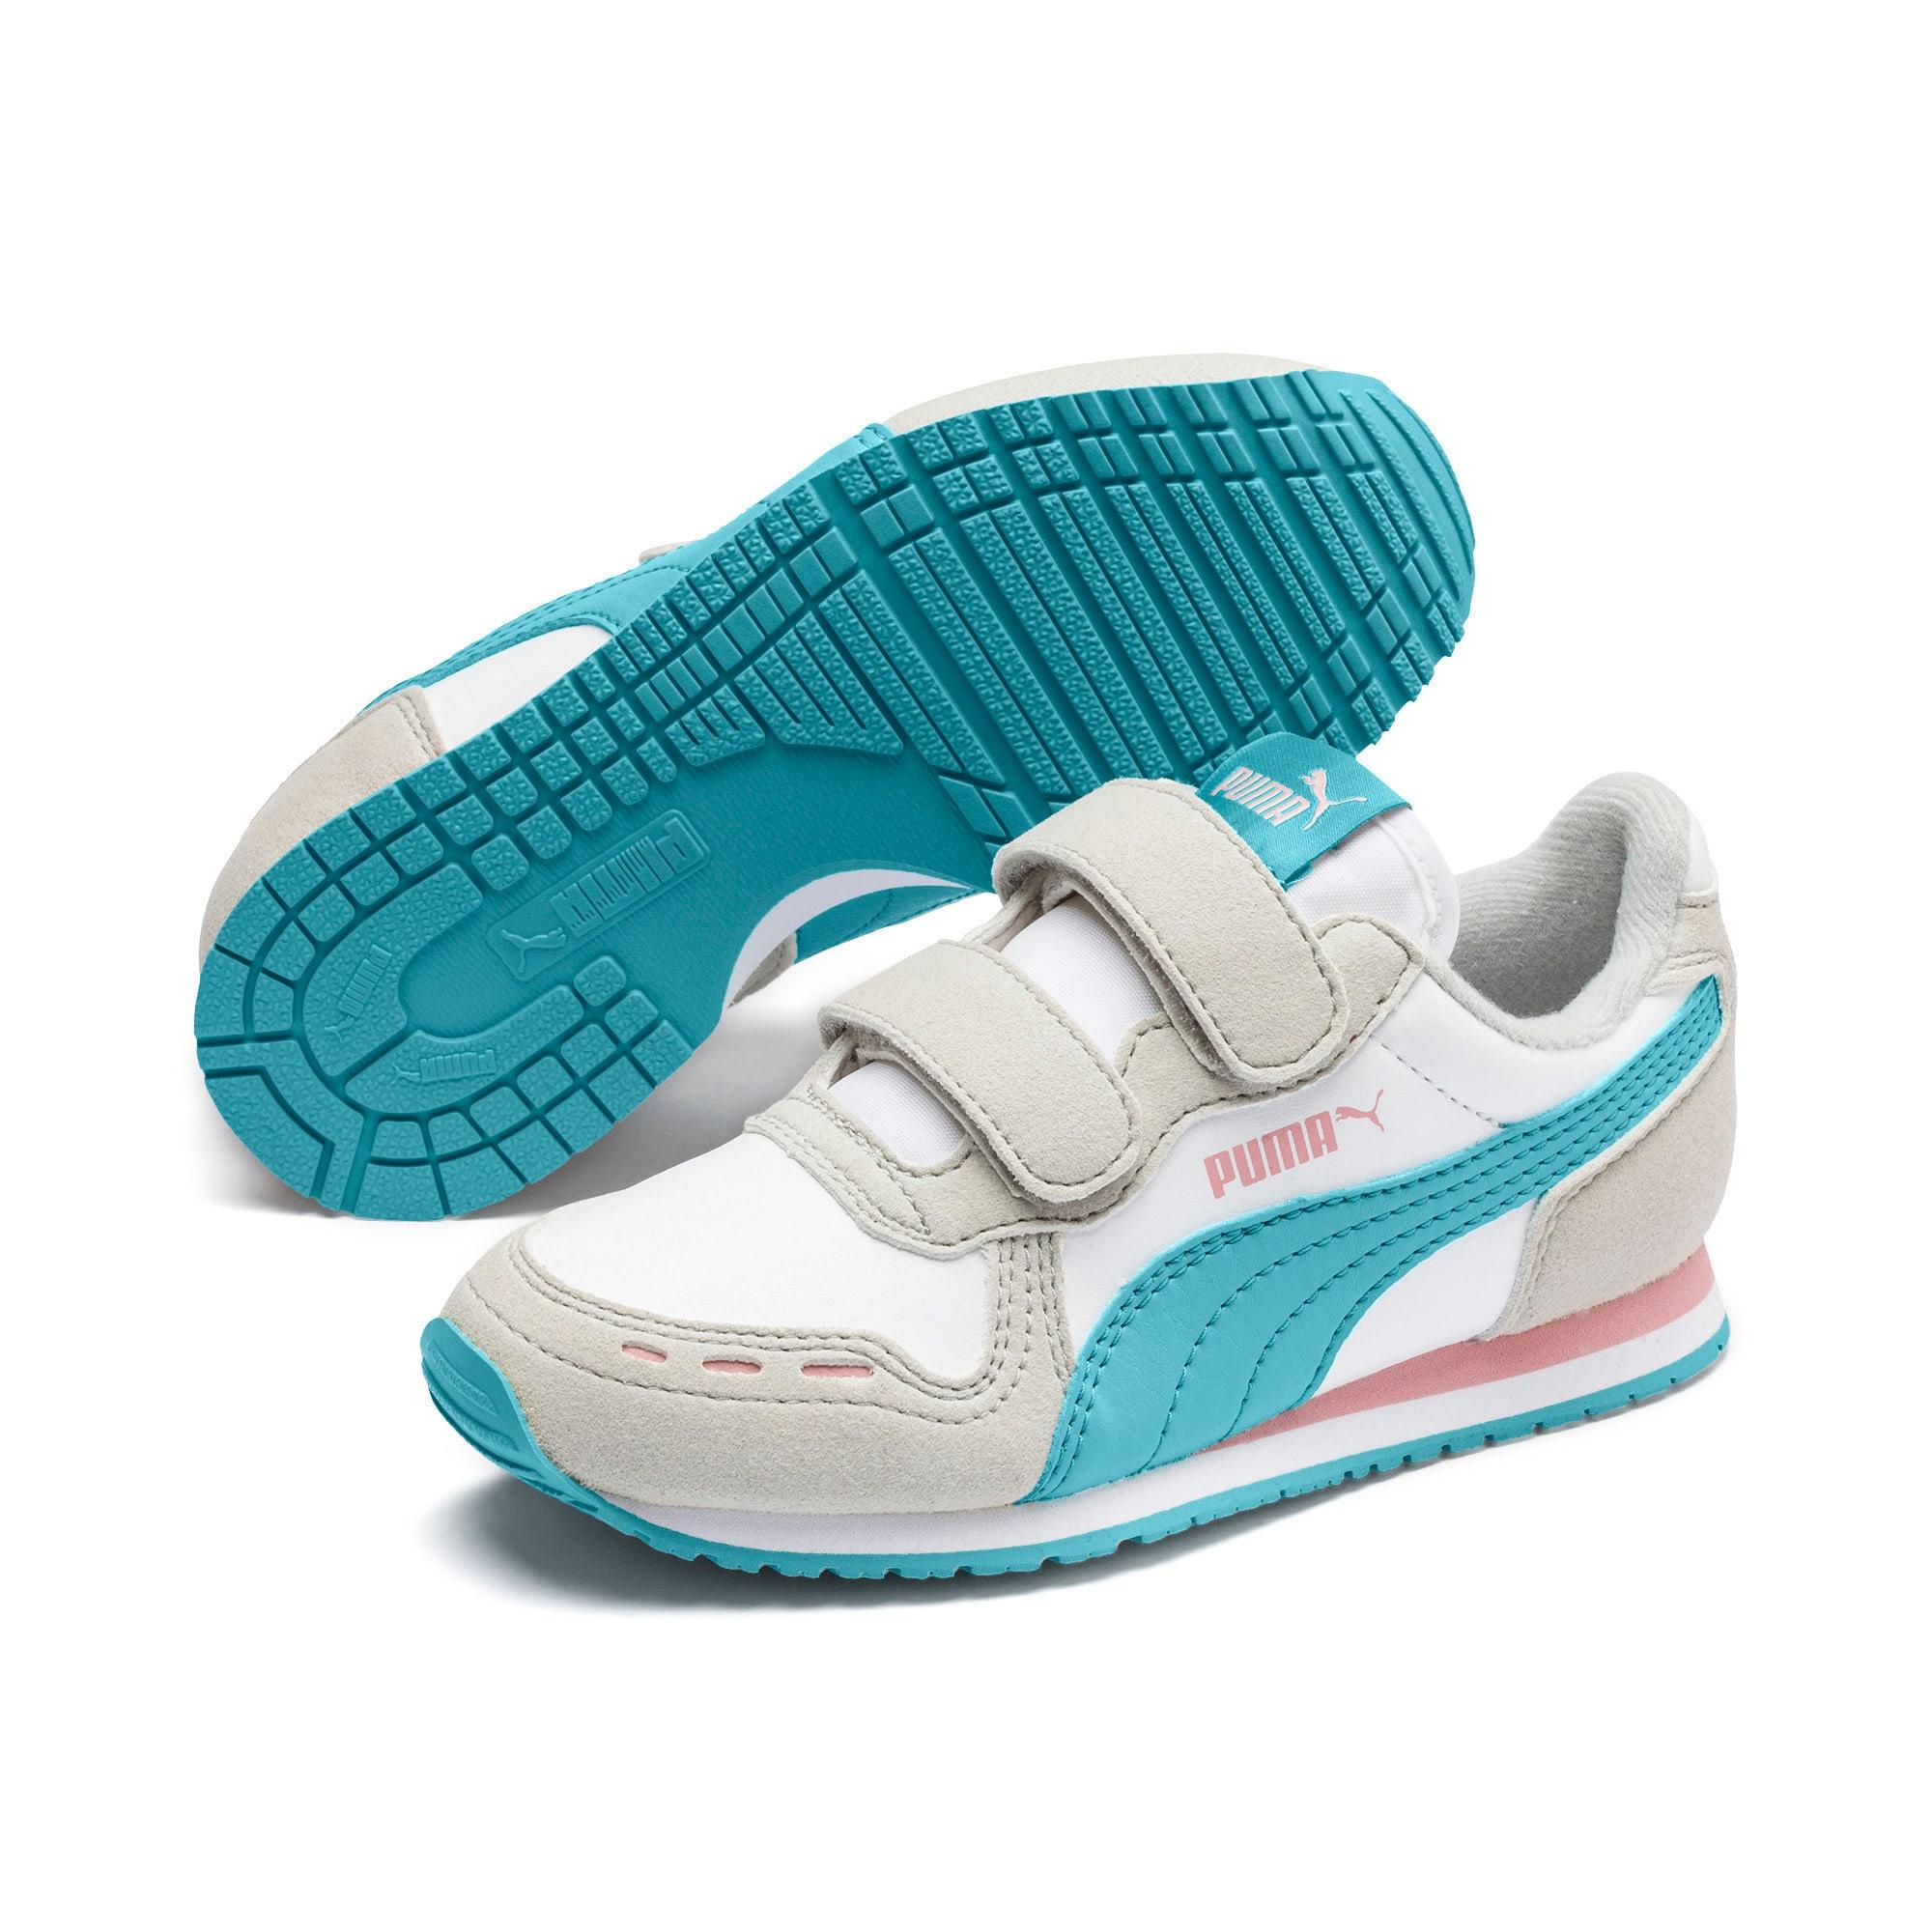 Thumbnail 2 of Cabana Racer SL V PS Baby Sneaker, Puma White-Milky Blue, medium